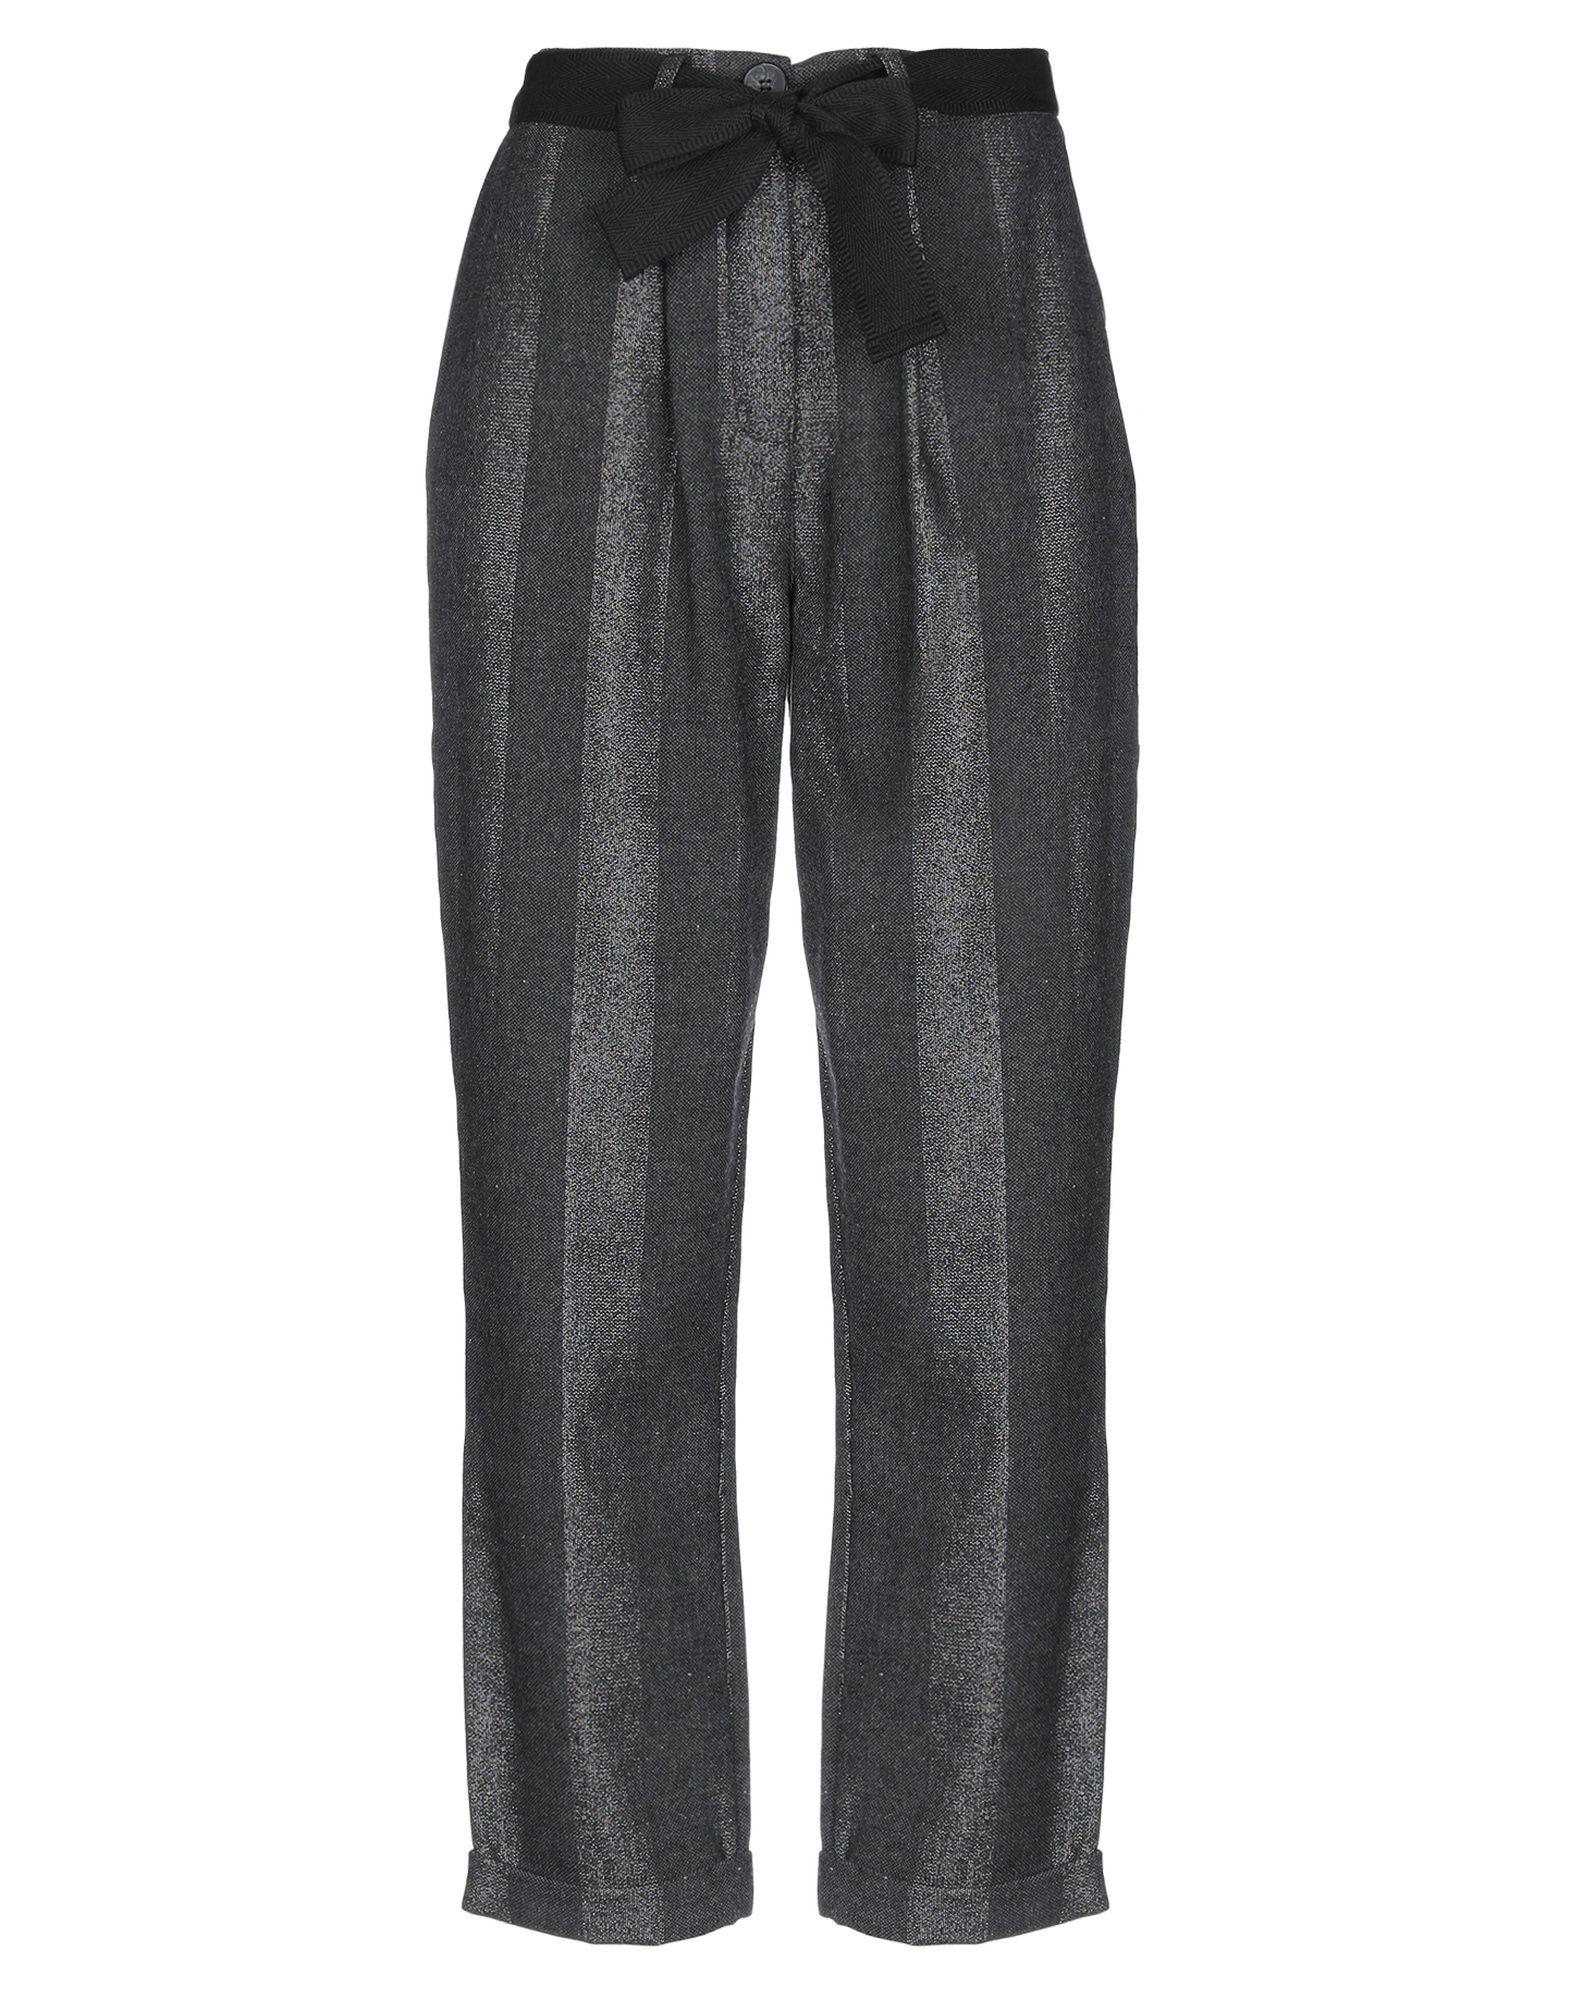 LA FEE MARABOUTEE Повседневные брюки